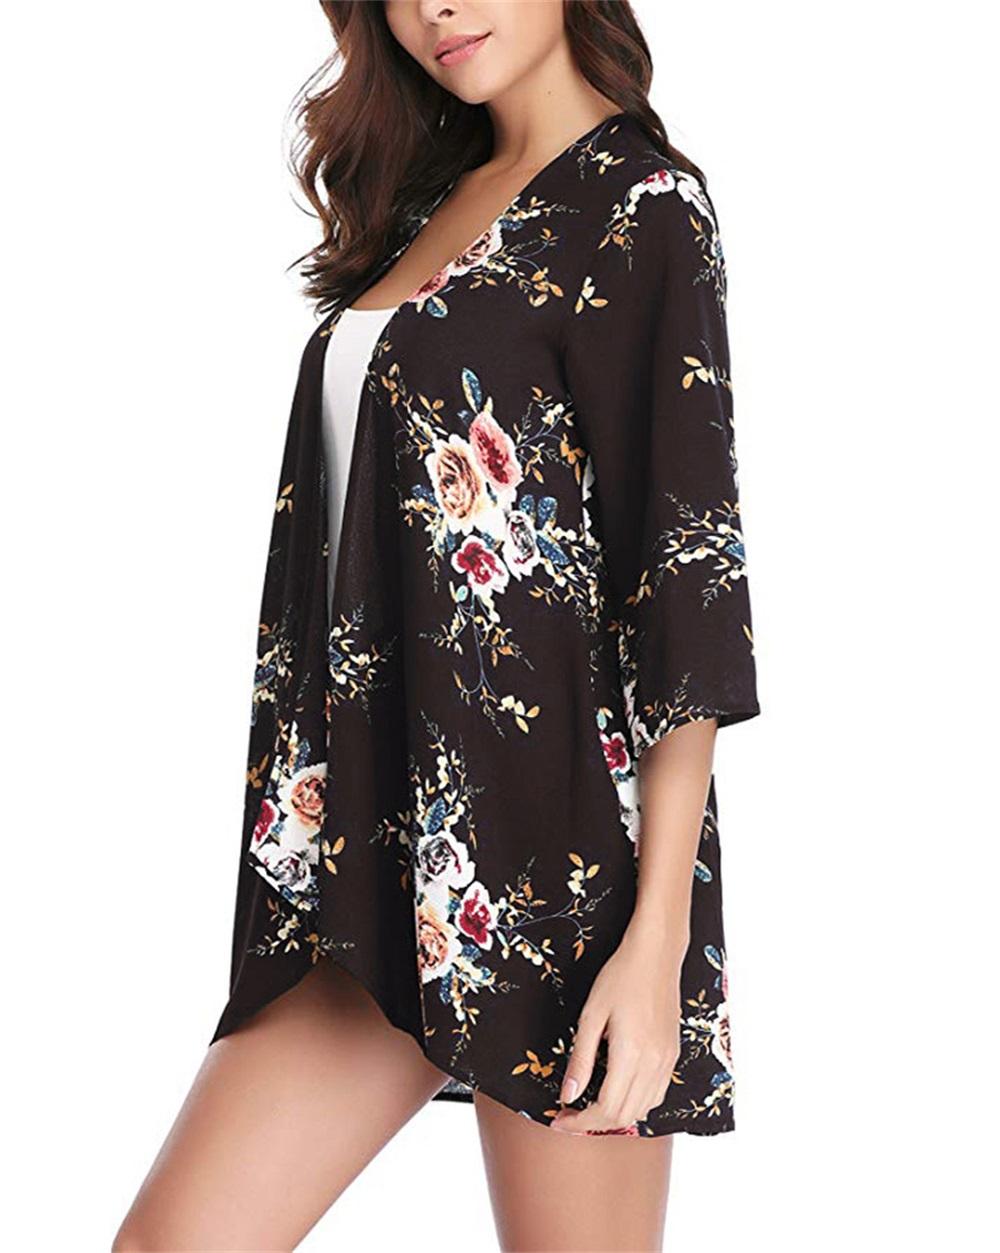 Fashion-Women-Loose-Blouse-Kimono-Cardigan-Tops-Summer-Bikini-Cover-Up-Wrap-Coat thumbnail 14